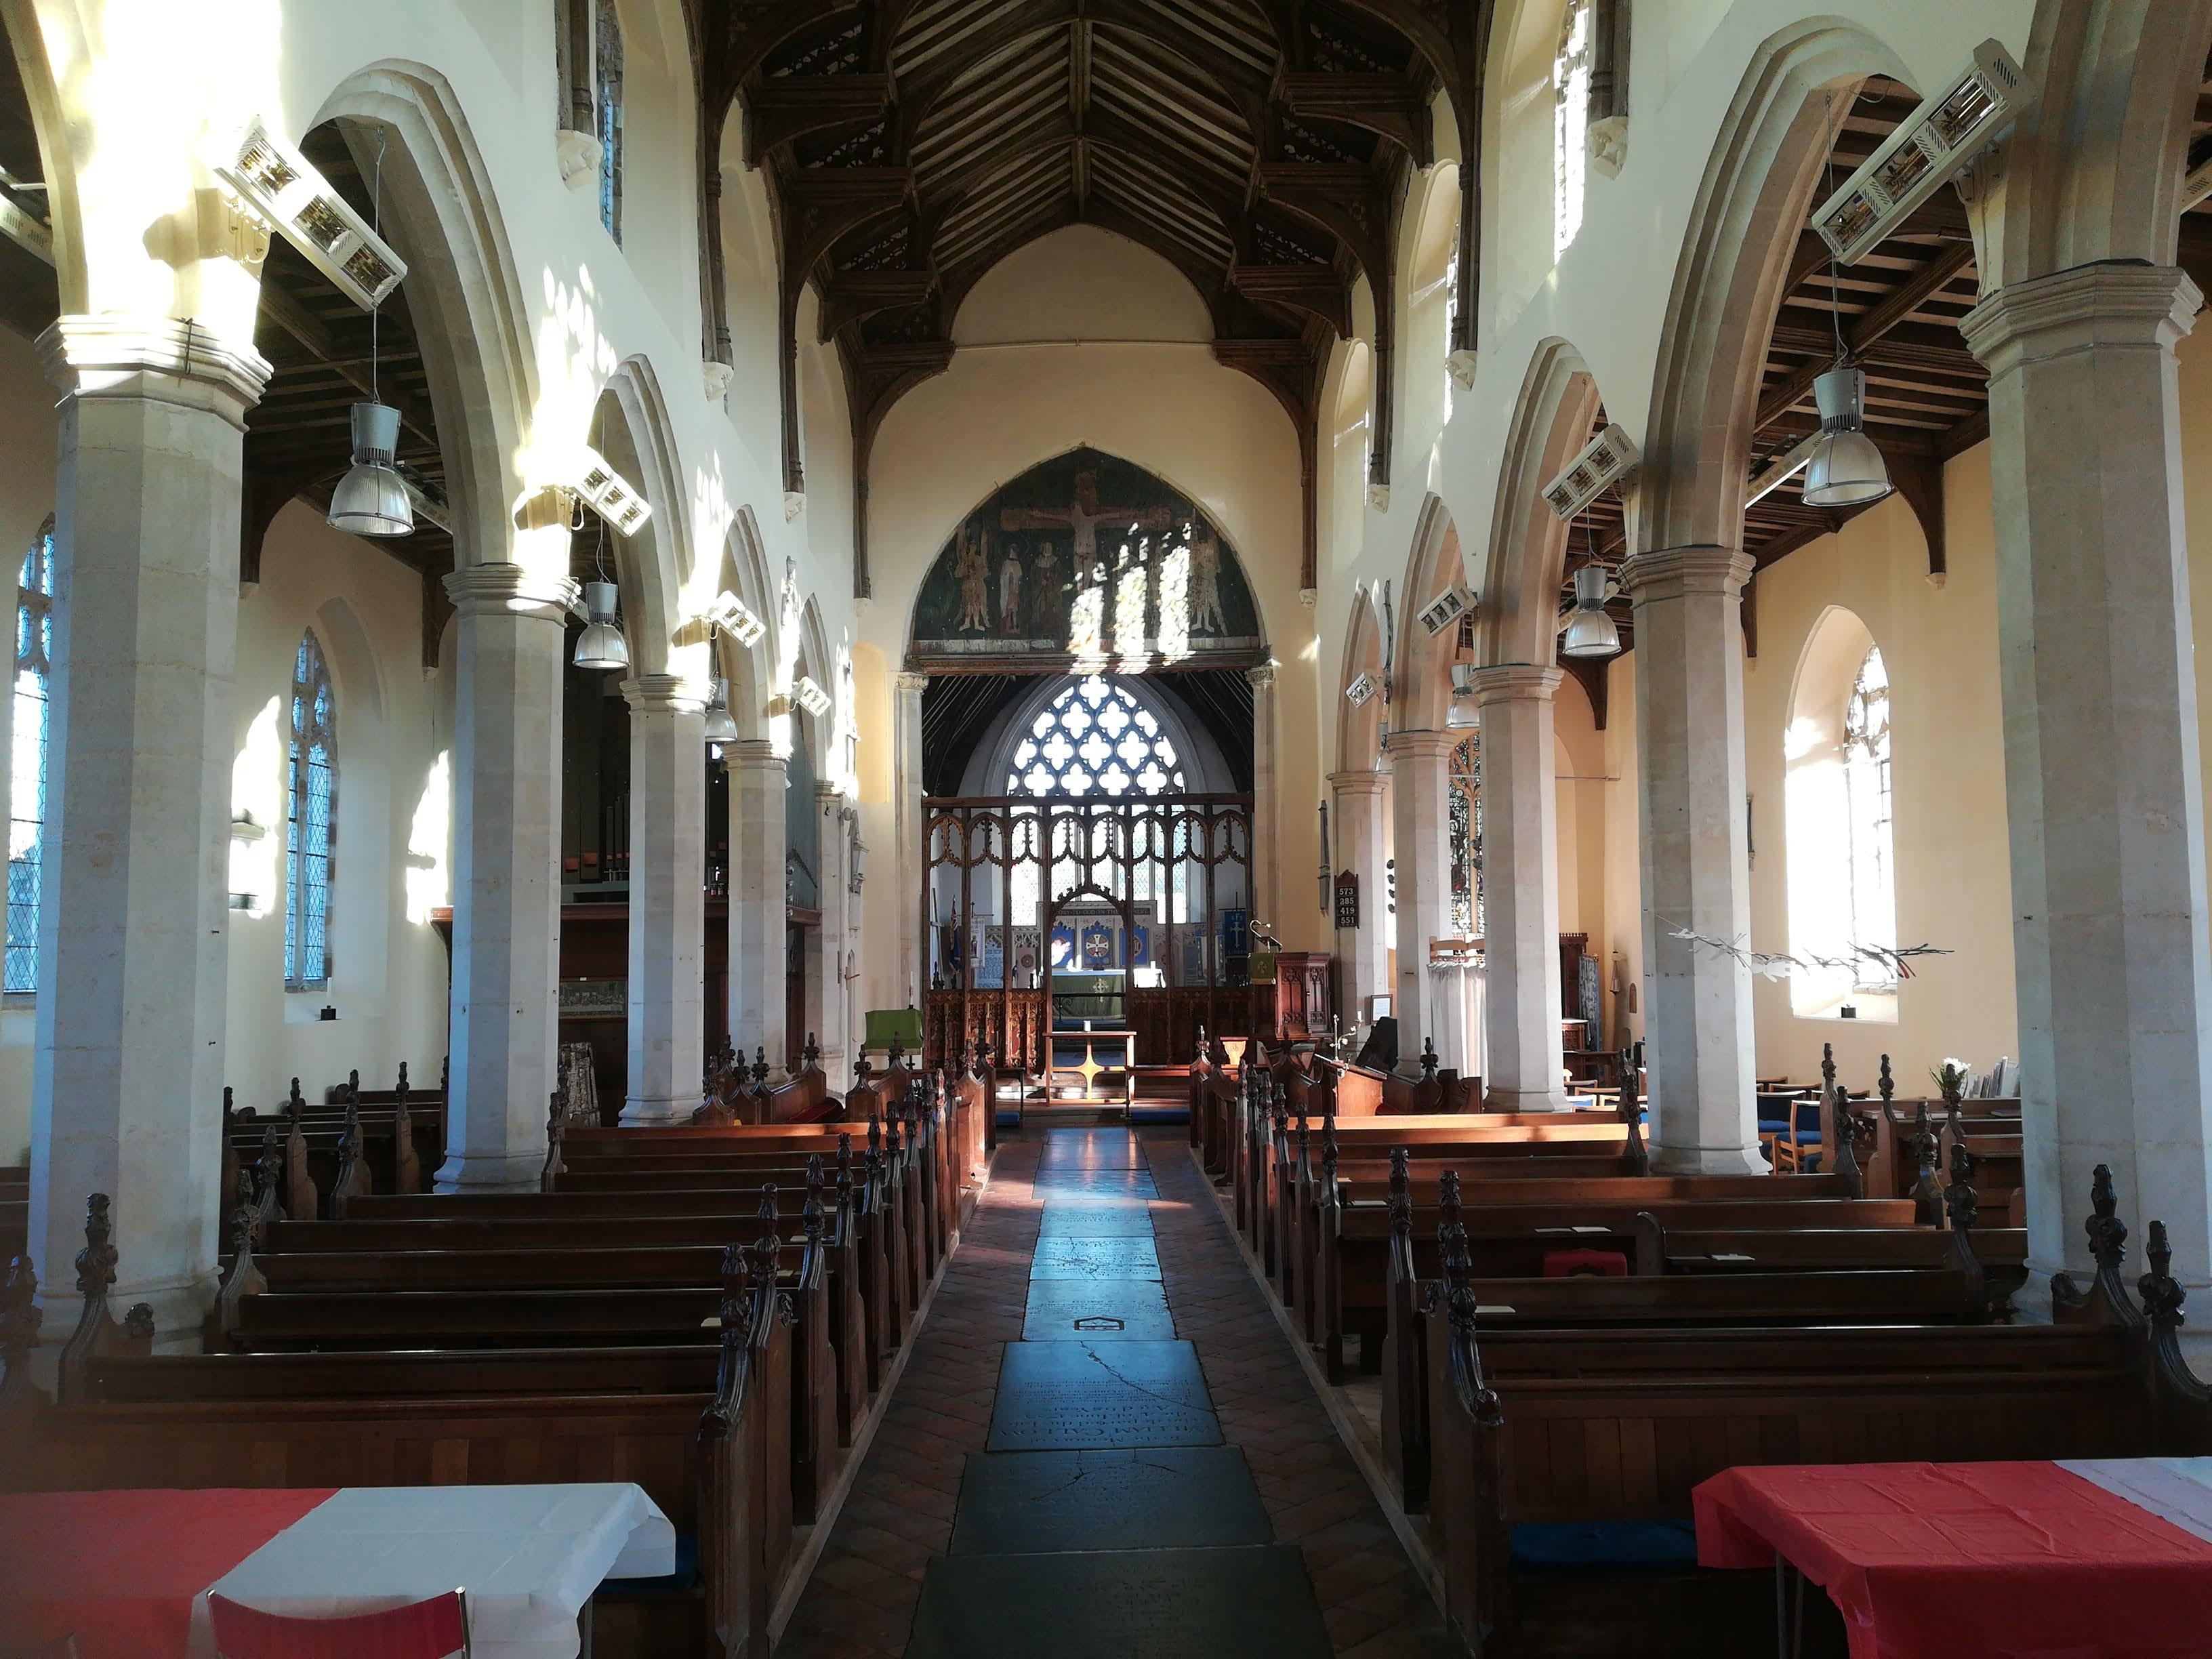 Ludham - St Catherine church 2(copyright St Catherine church)